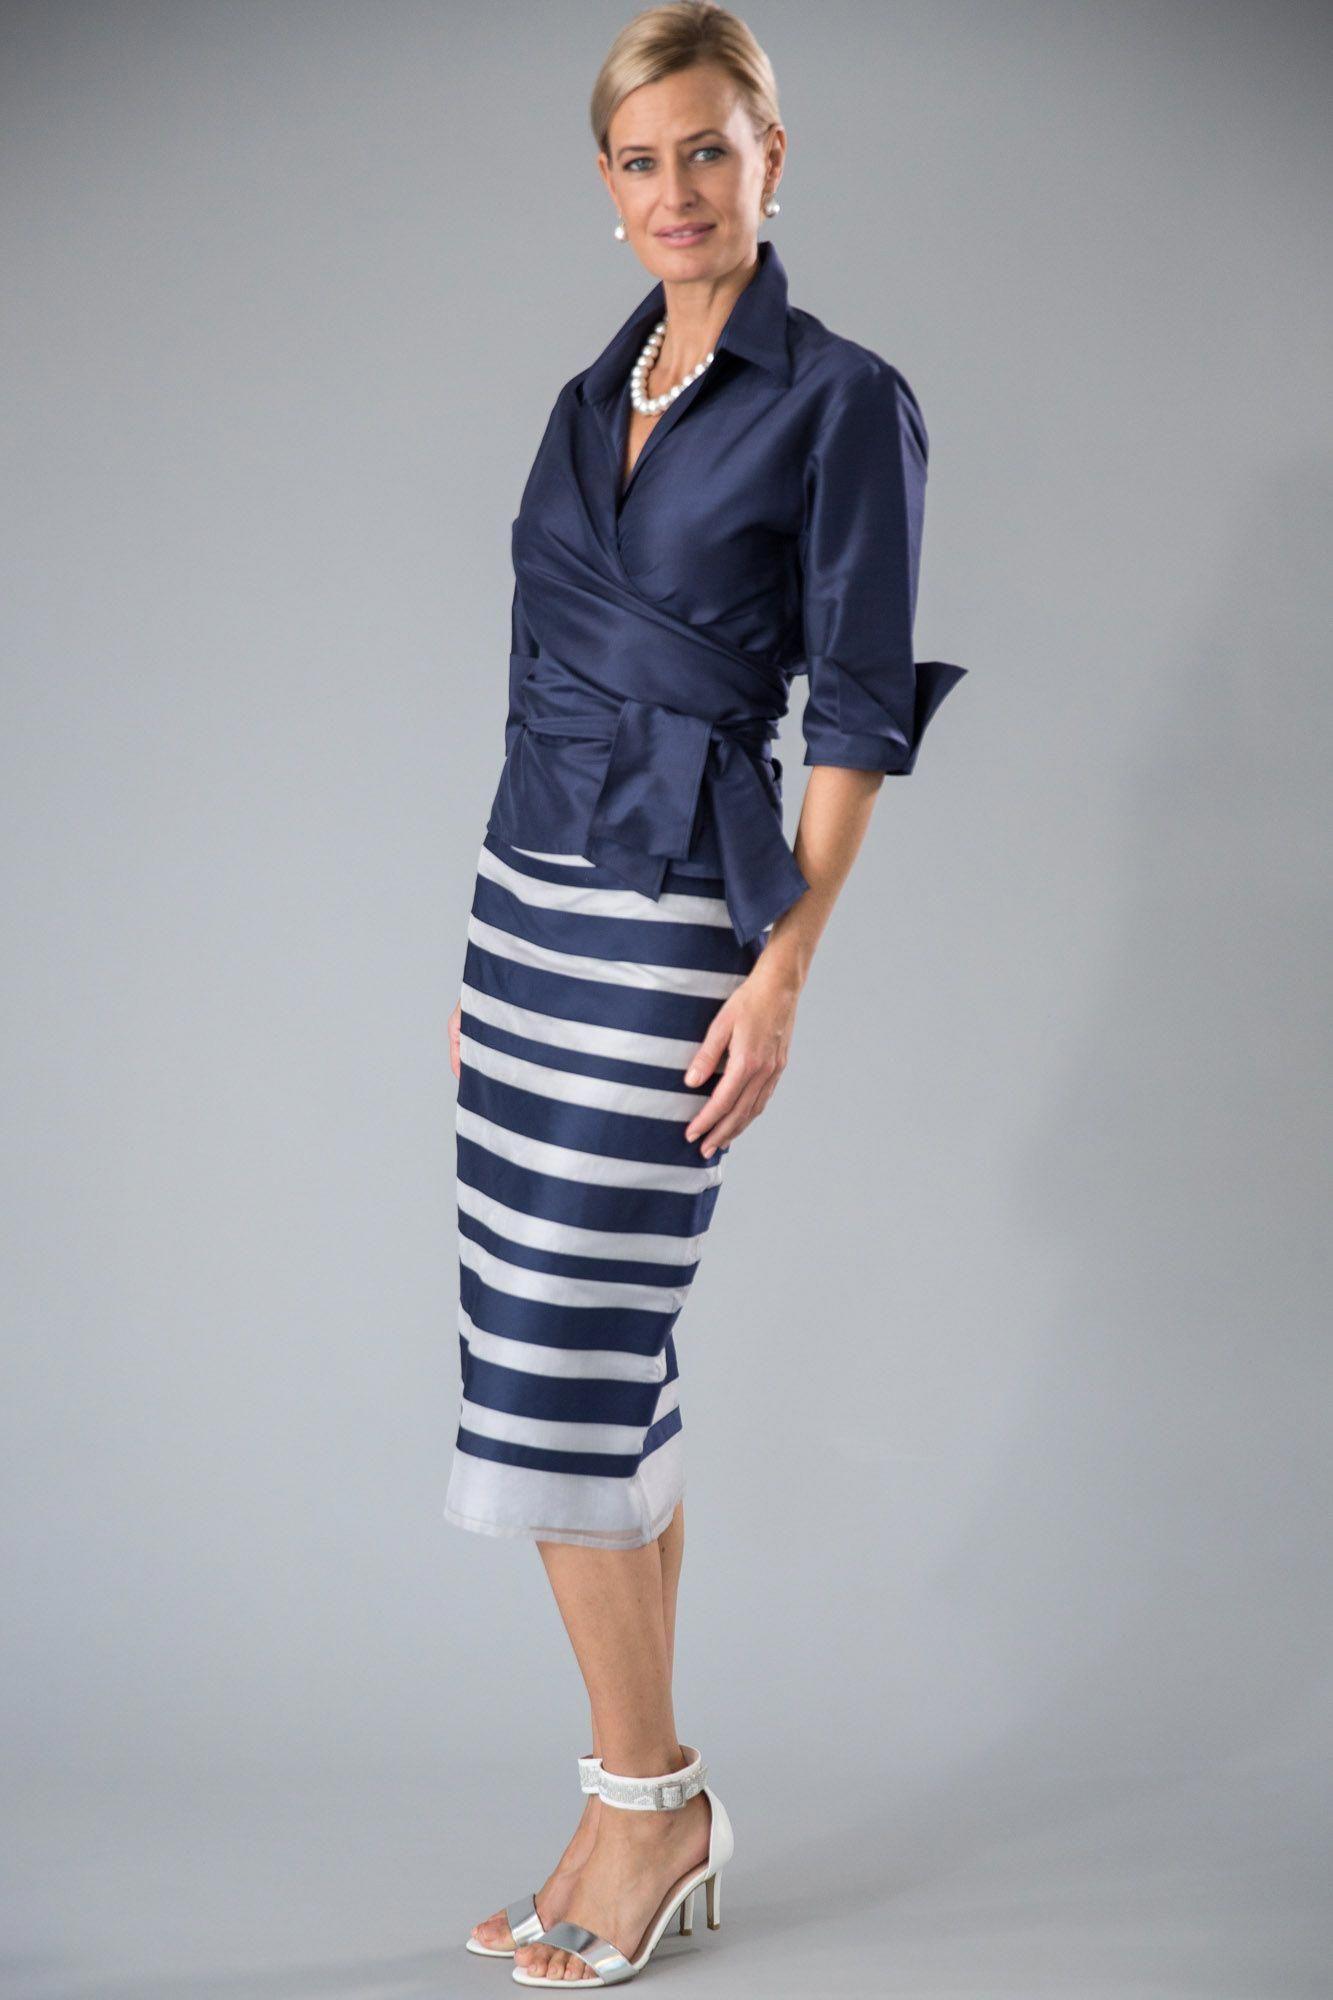 Women S Plus Size Patio Dresses #WomenSPlusSizeTieDyeDresses ...